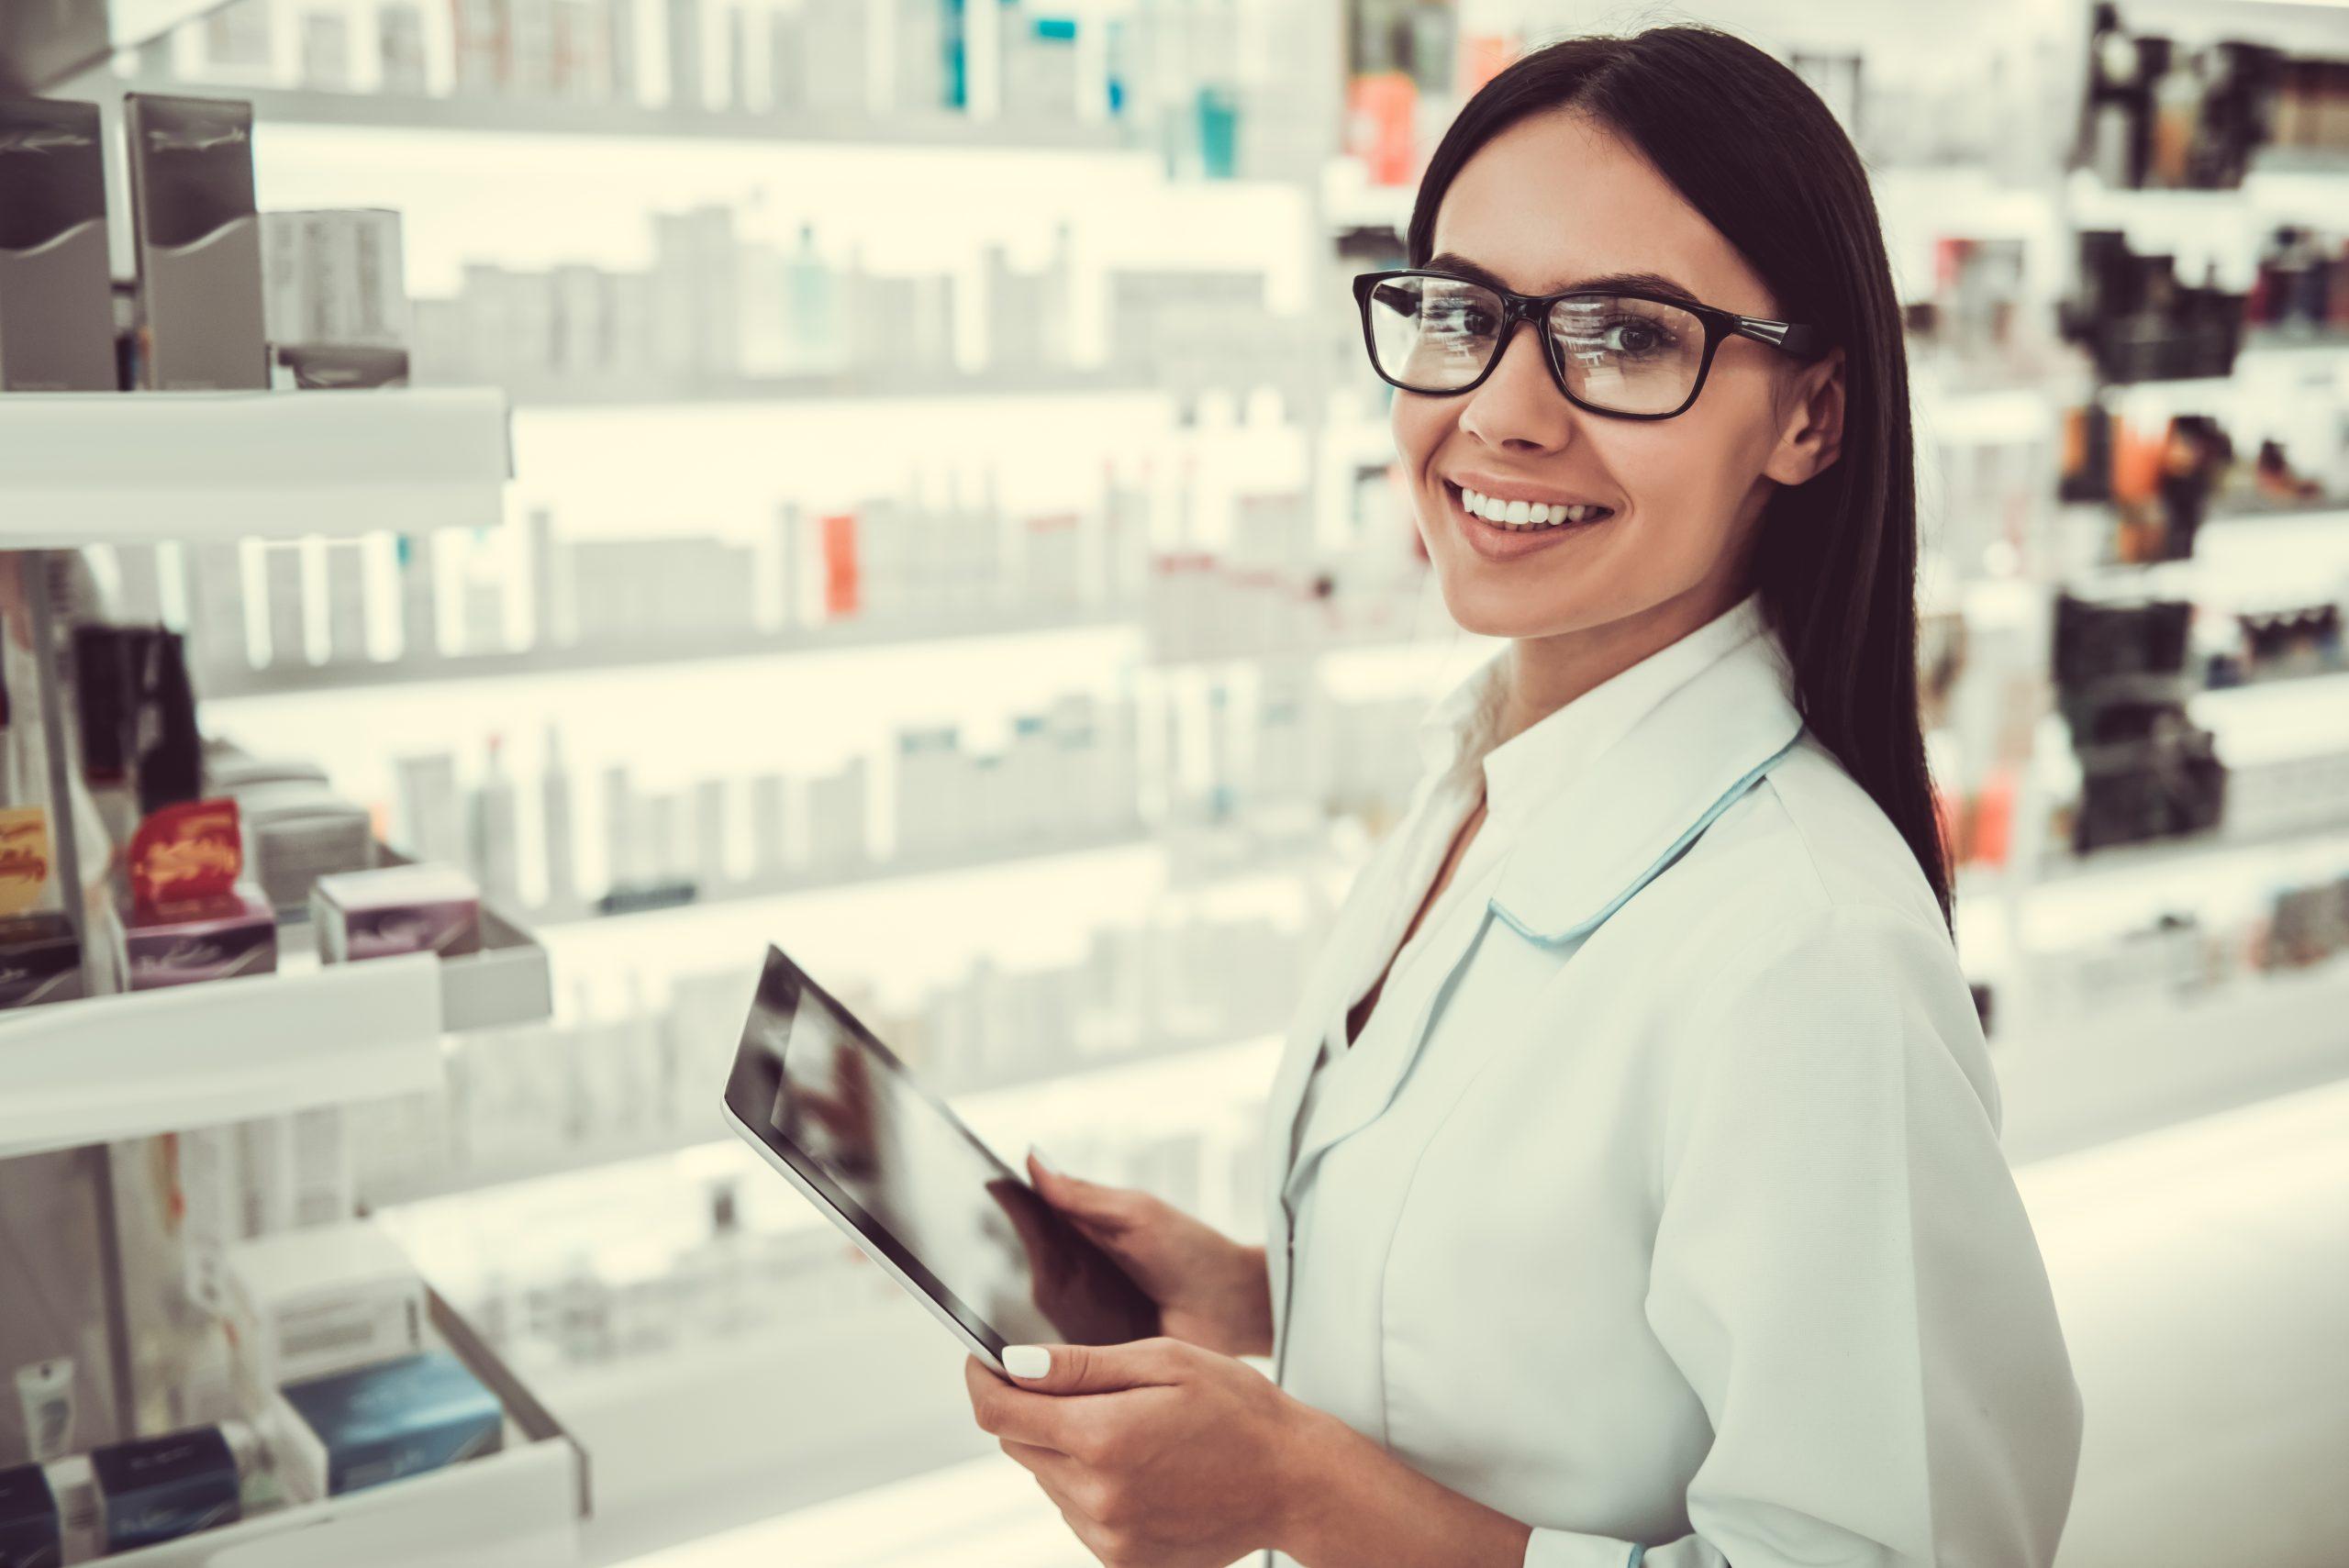 PHCC Celebrates World Pharmacists Day